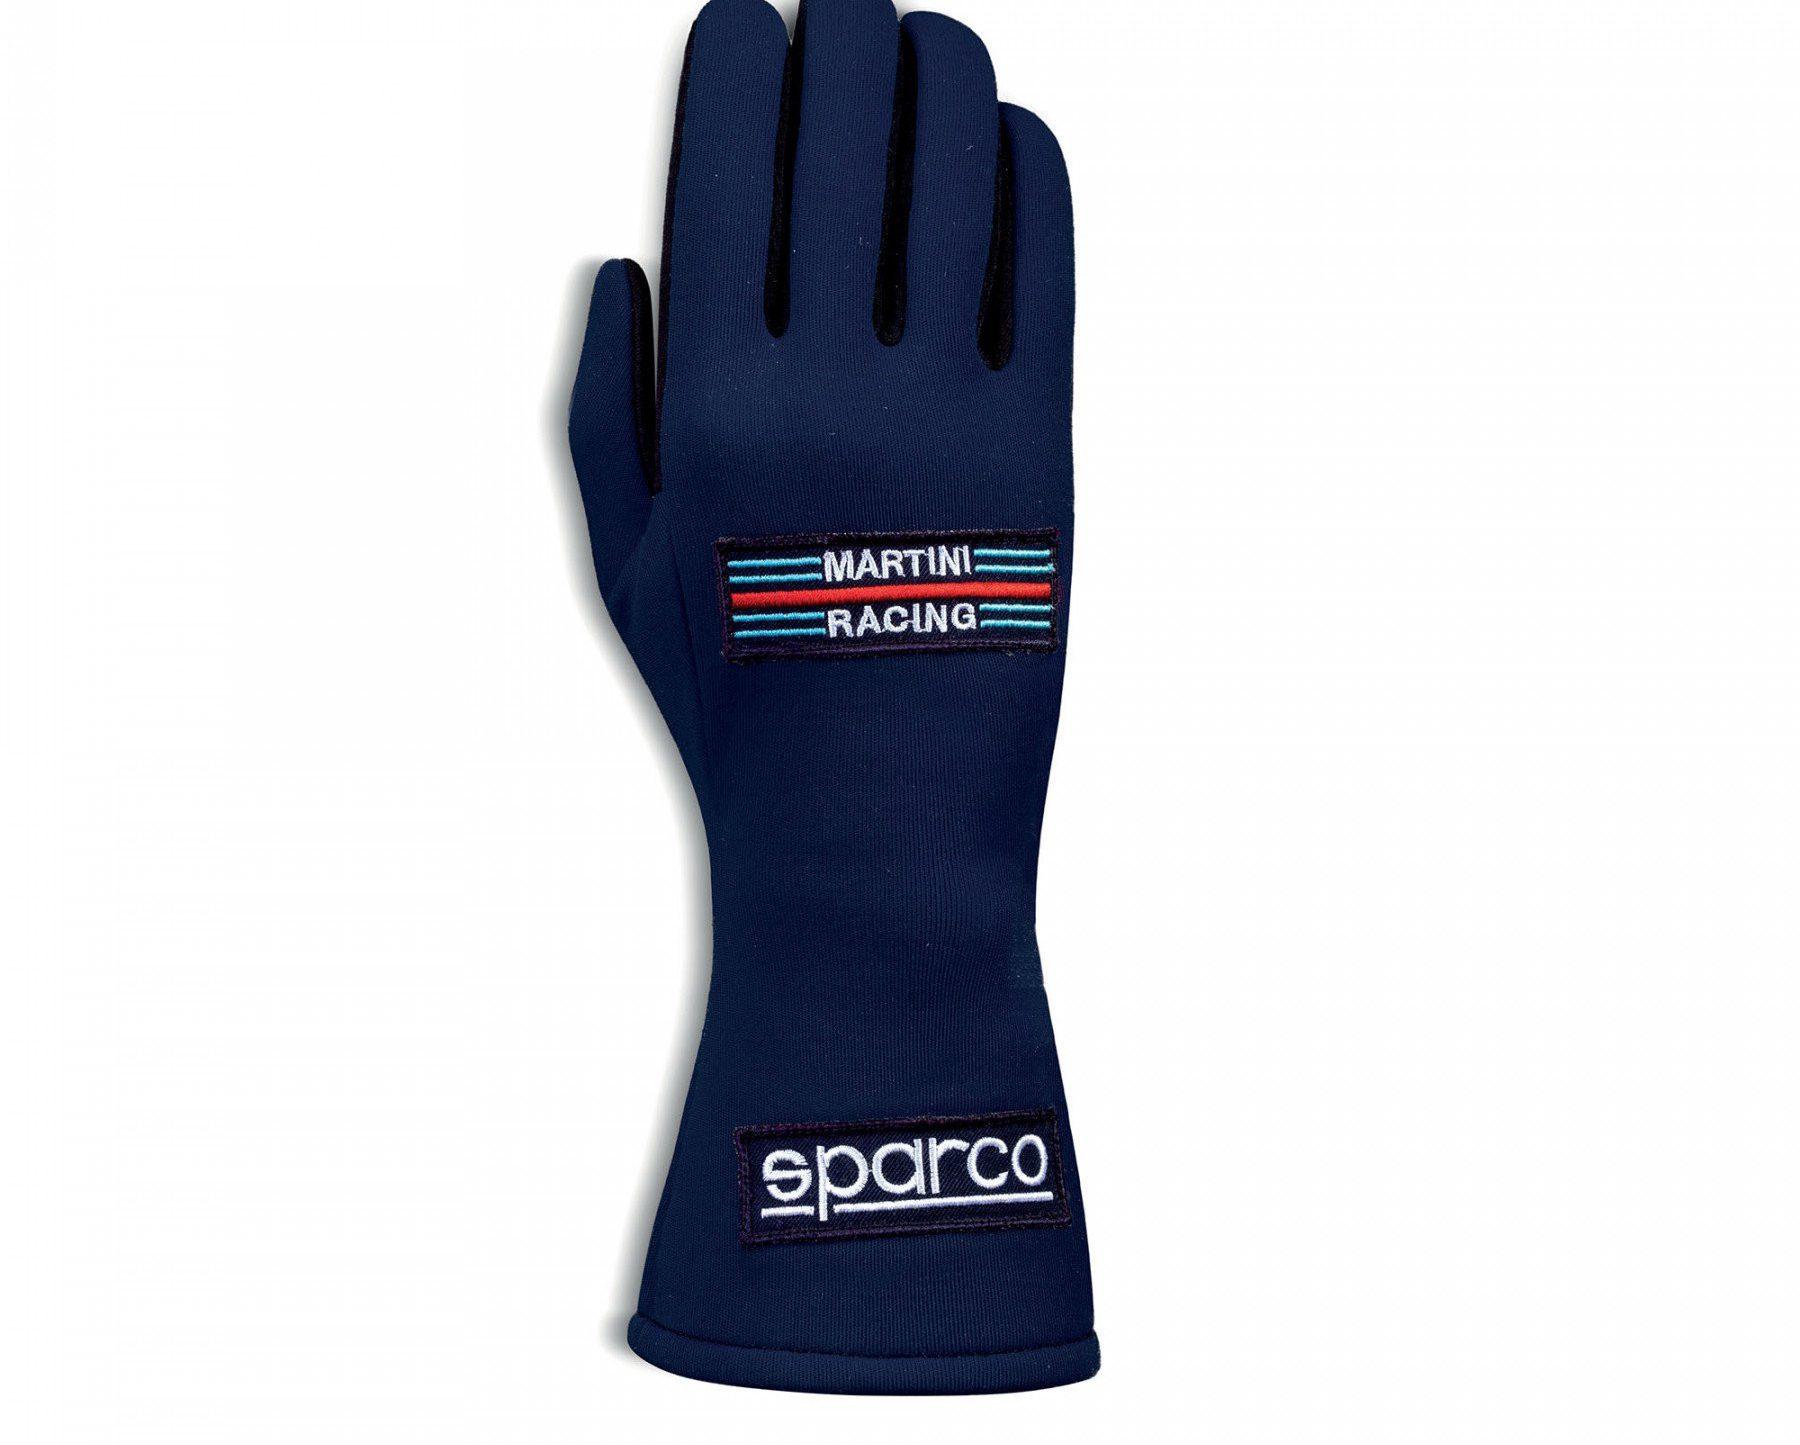 Нов продукт: FIA Sparco Martini Racing, Racing Gloves